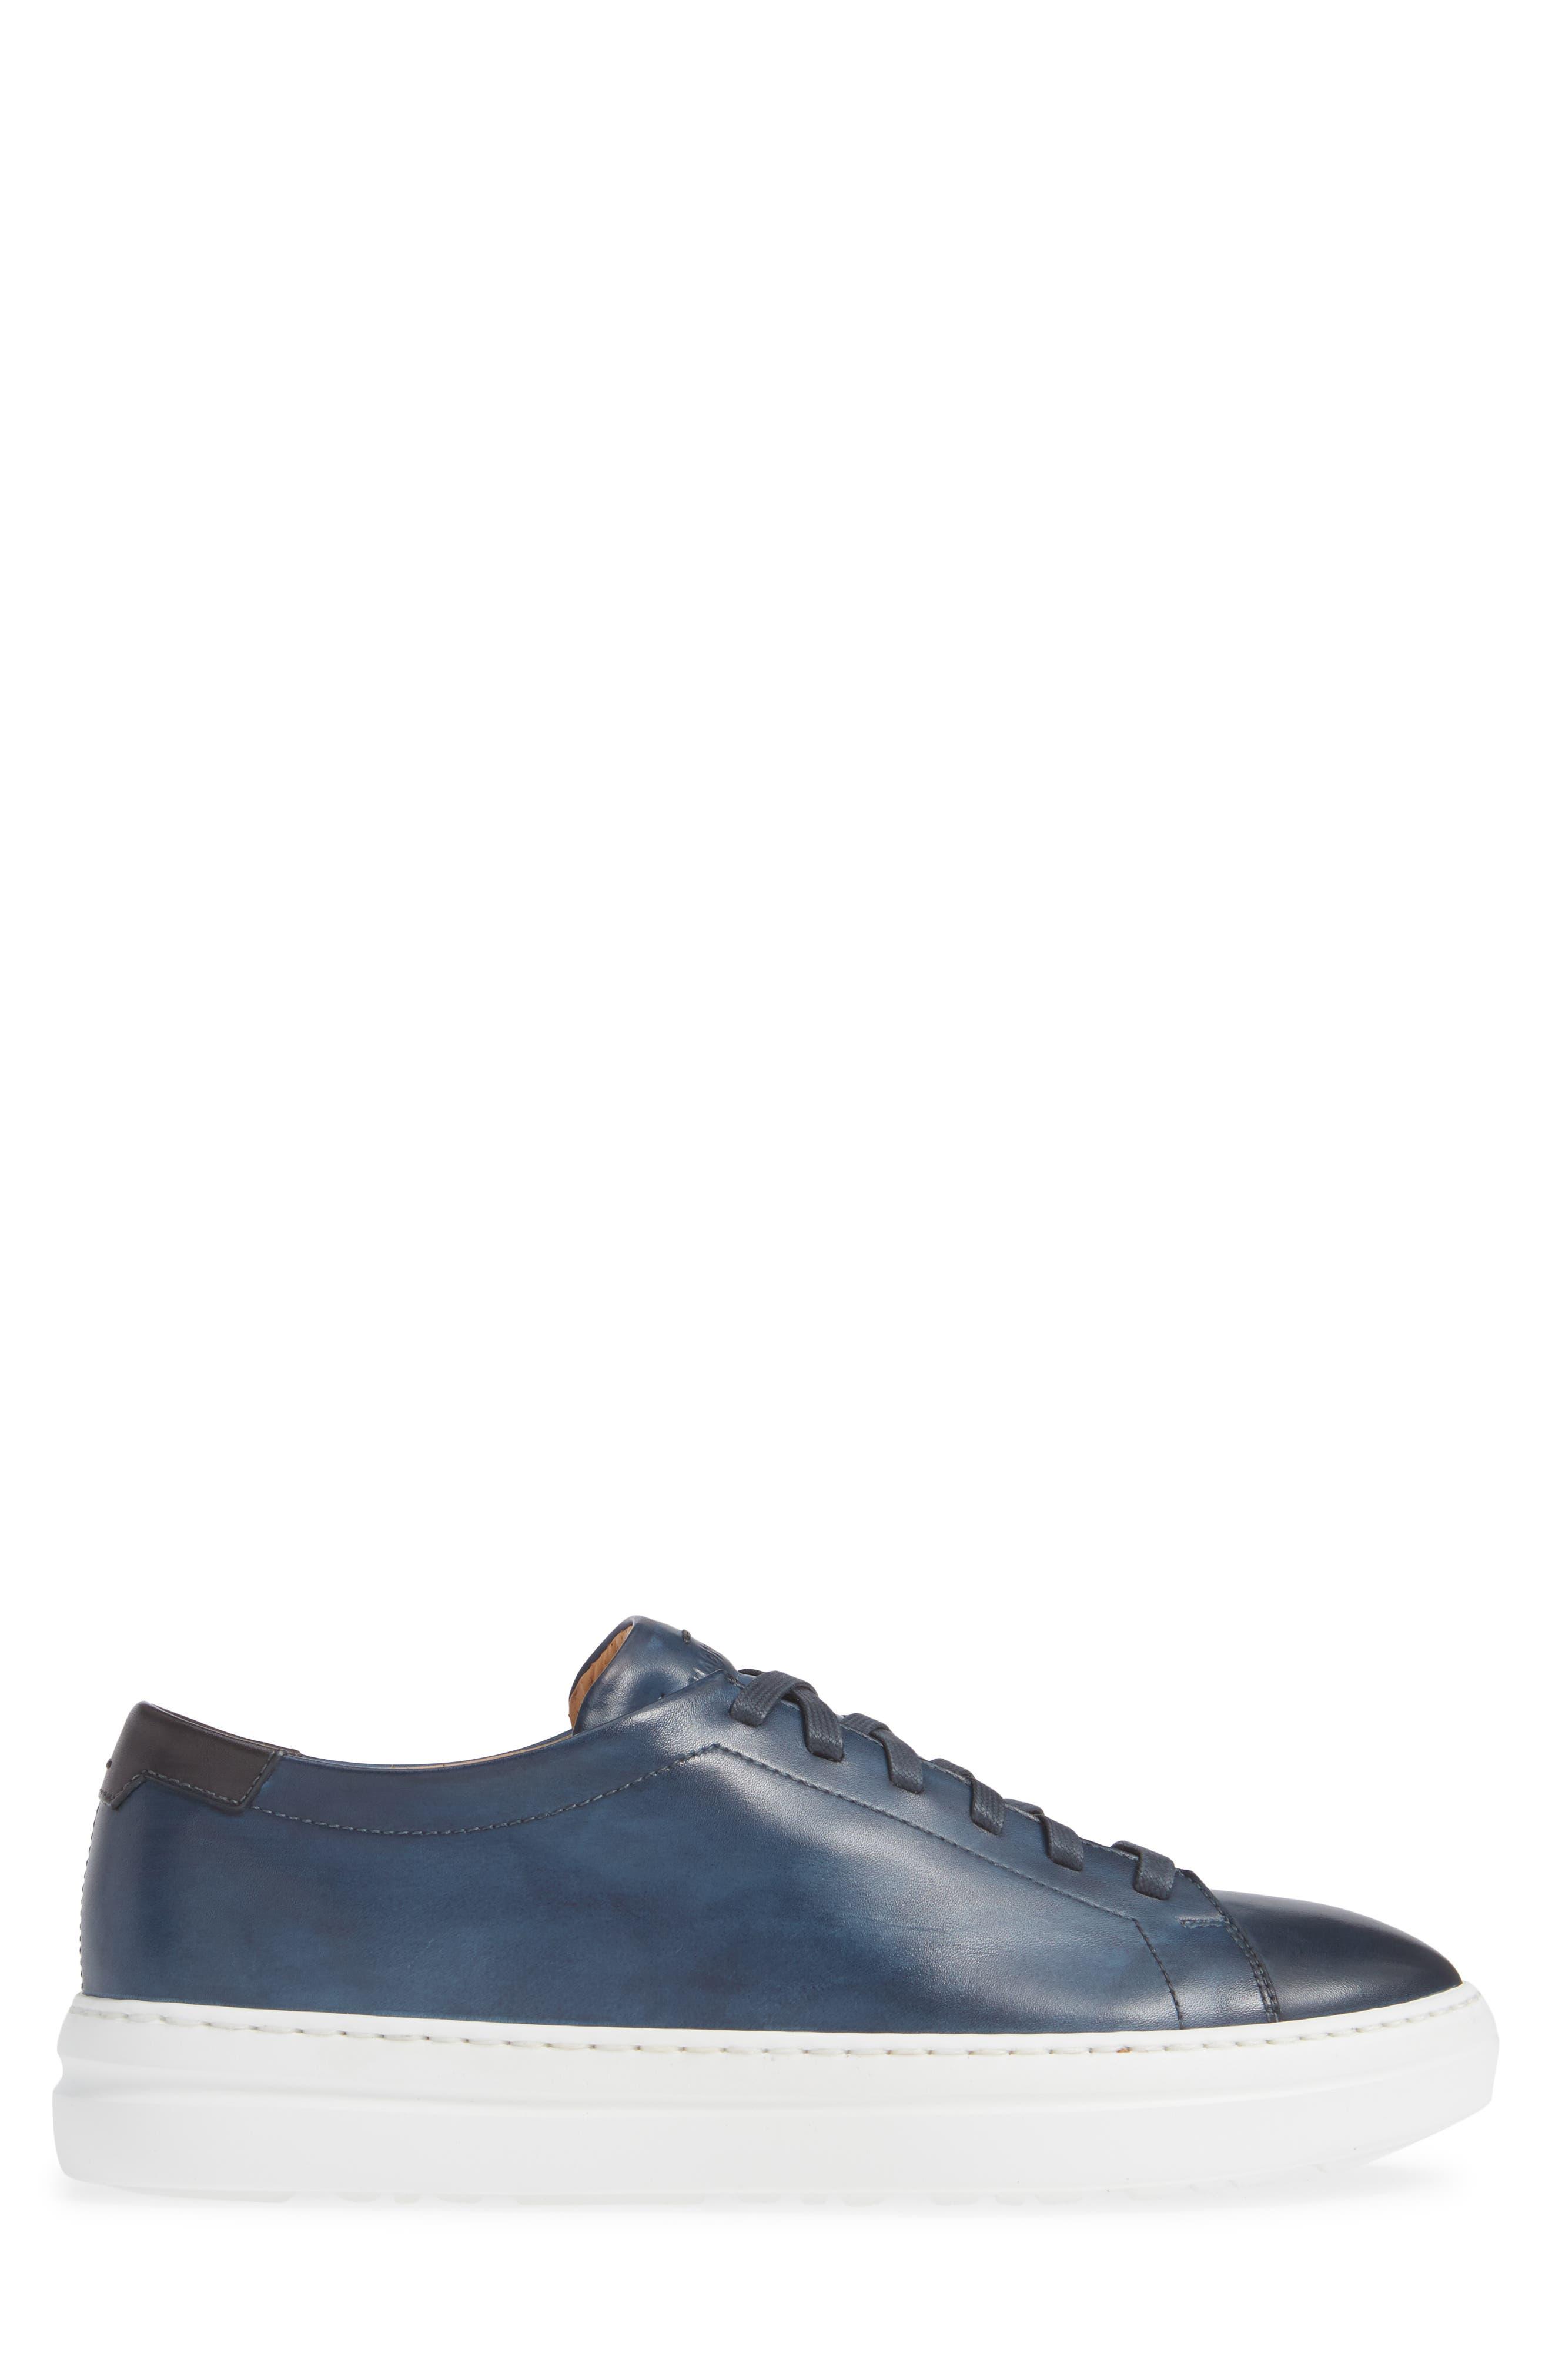 MAGNANNI, Bartolo Sneaker, Alternate thumbnail 3, color, NAVY LEATHER